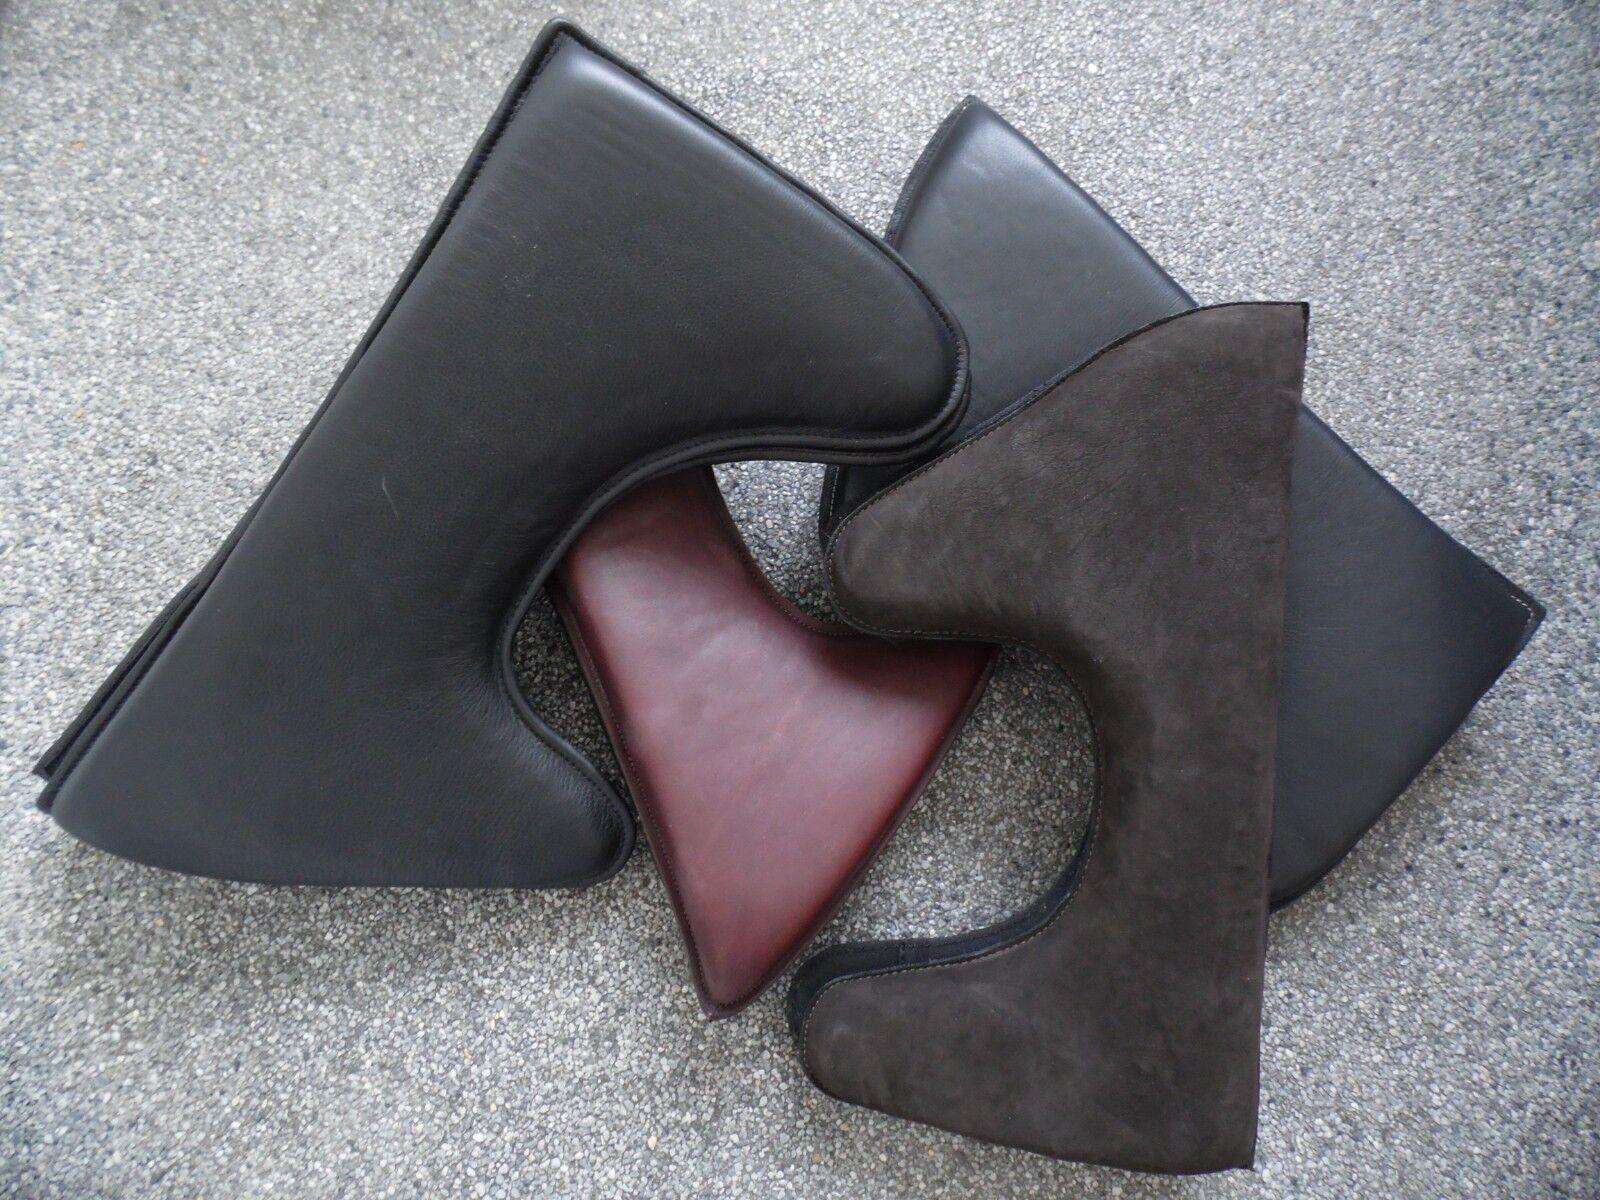 Hidalgo Klettkissen Spanisch 45 cm / 4/5/6 - Farbe Dunkelbraun - Neu